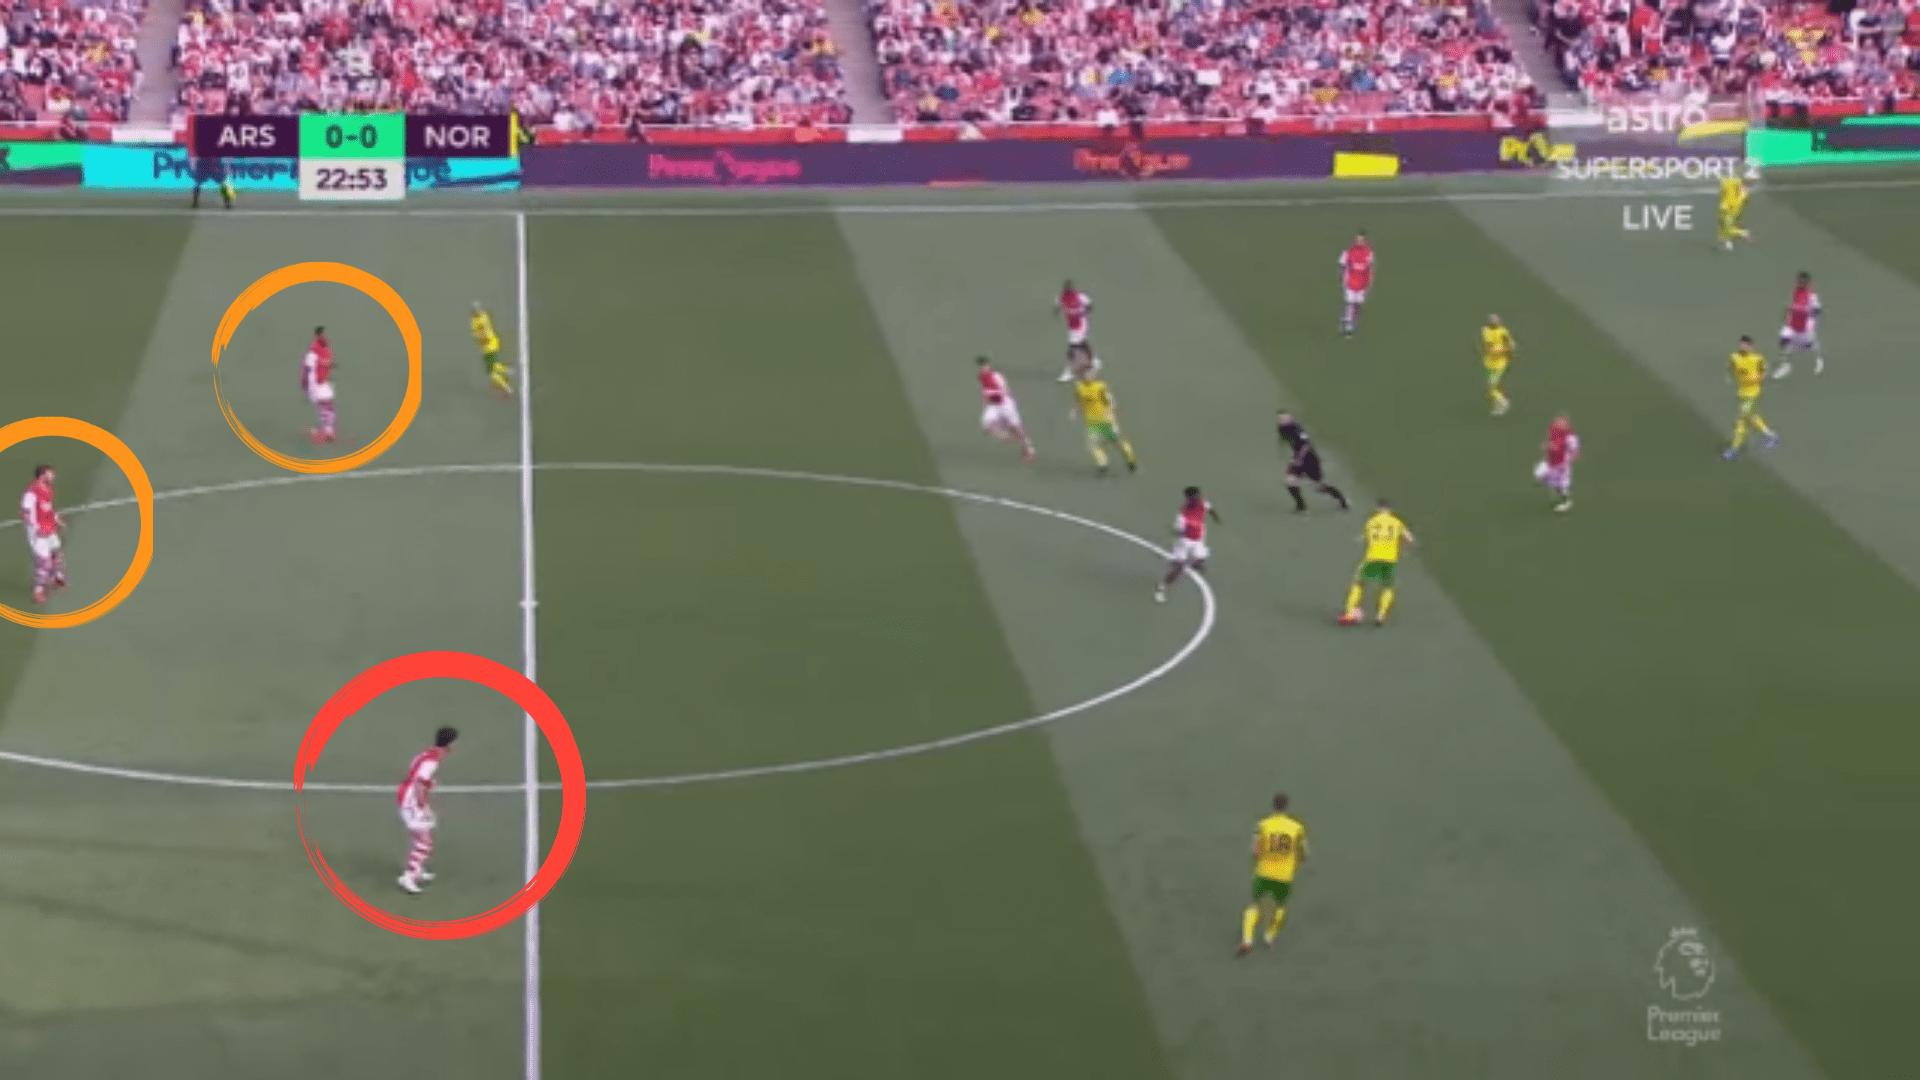 Takehiro-Tomiyasu-Inverted-Full-Back-Arsenal-Analysis-vs-Norwich-City